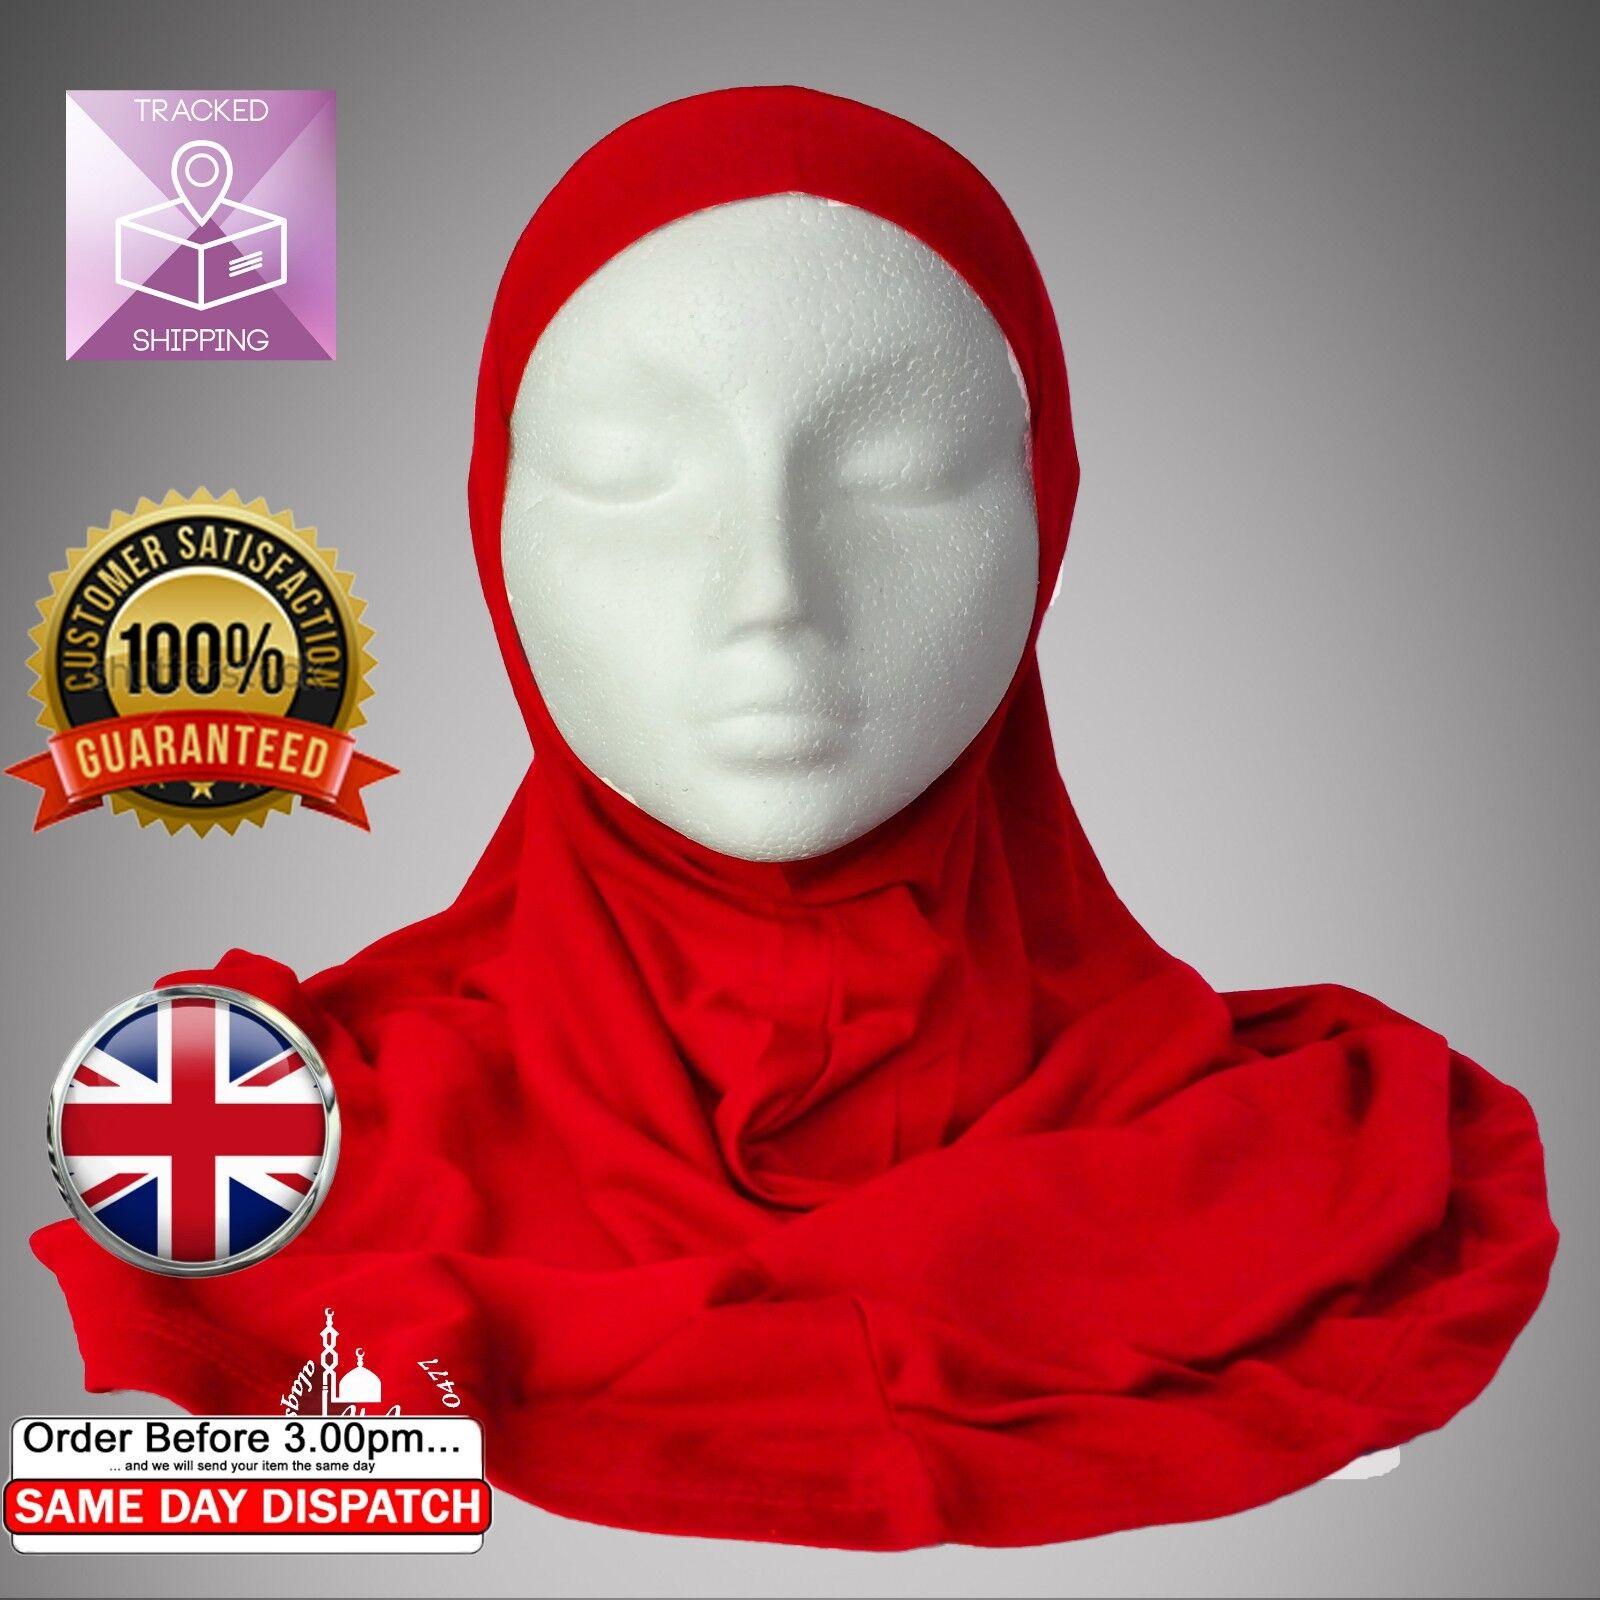 New Brigh red hijab, One peice hijab, Islamic mosque scarf, girls hijab